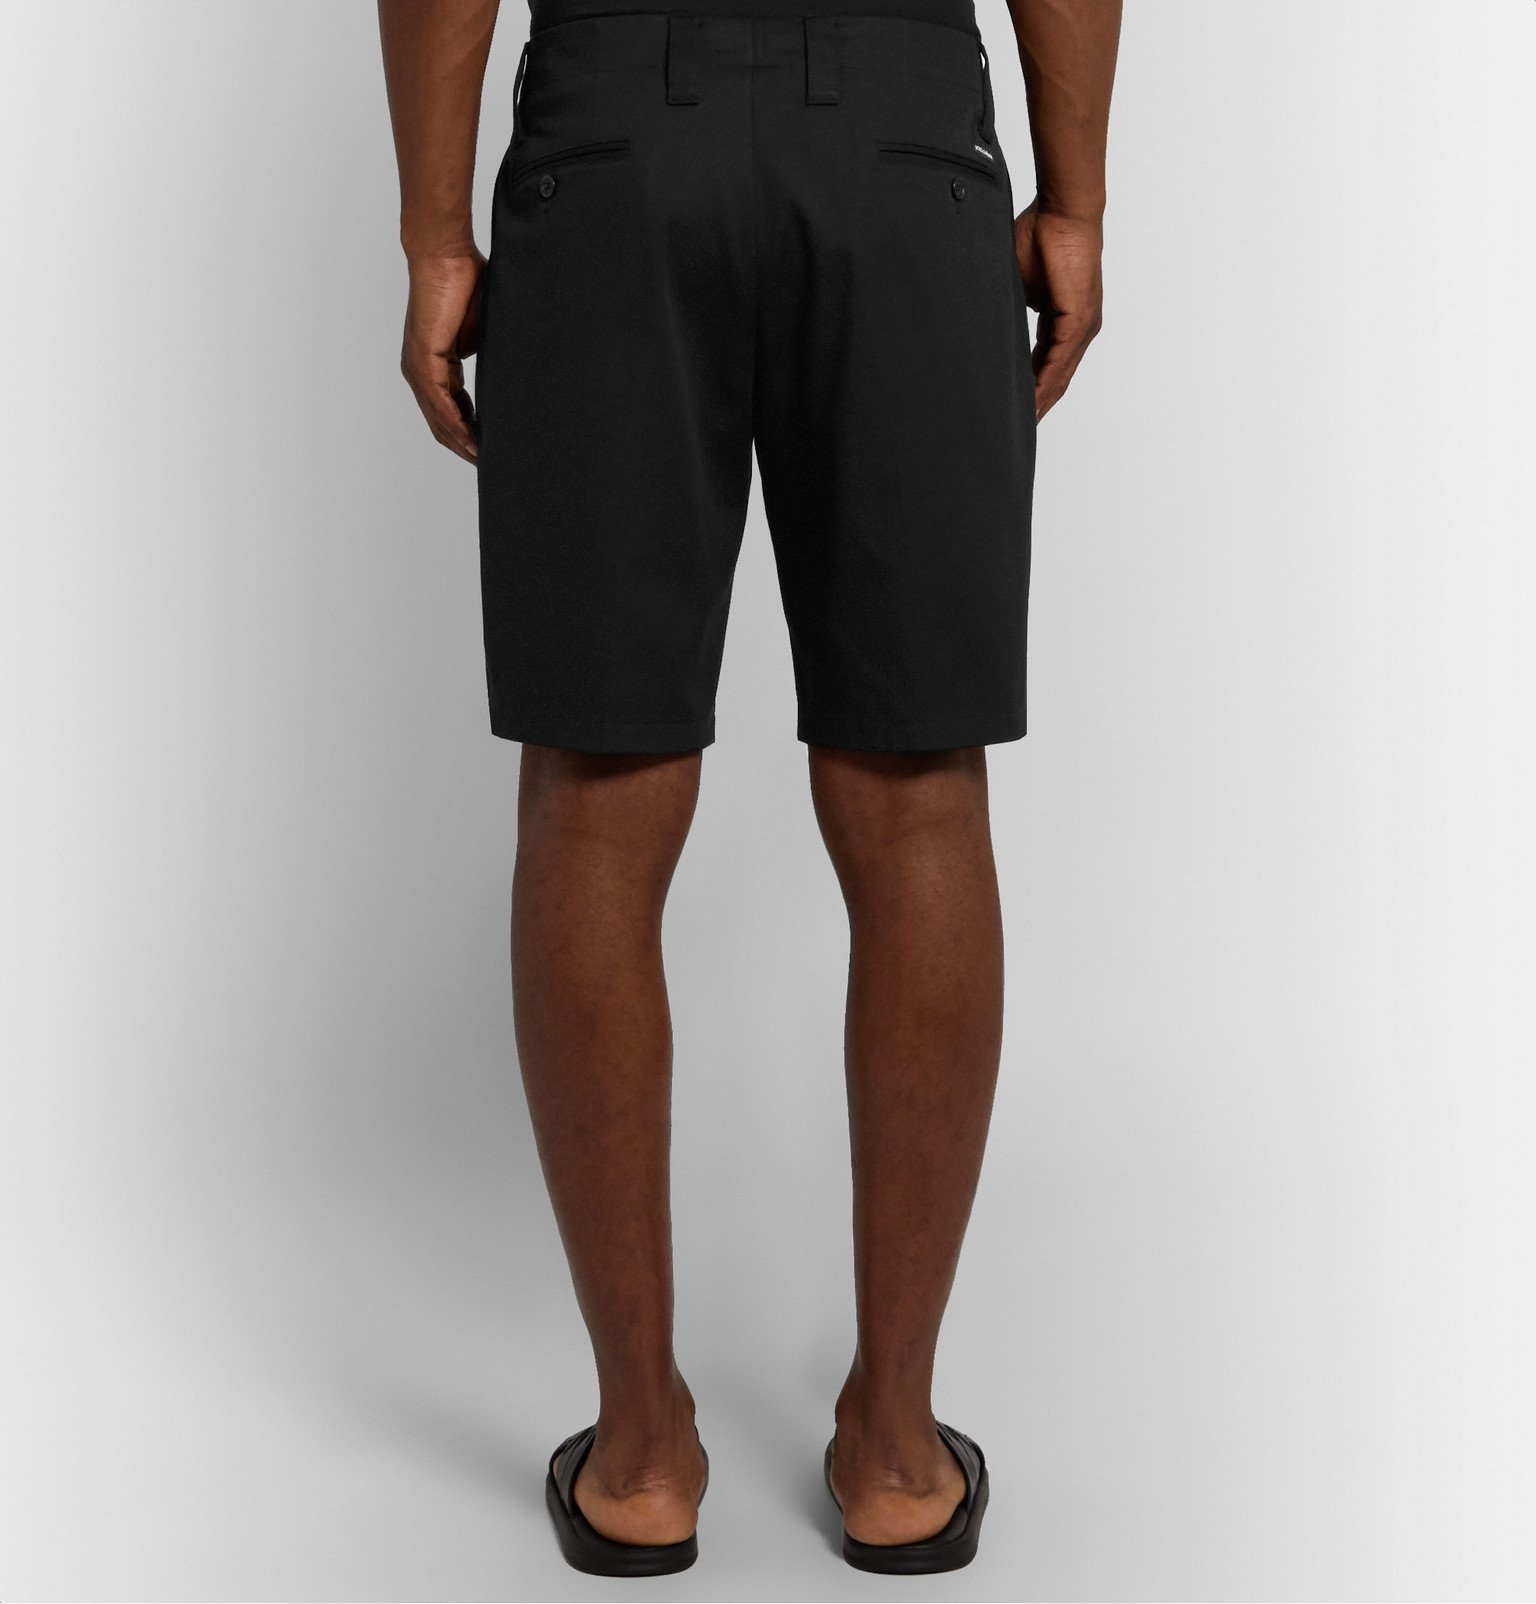 Dolce & Gabbana - Pleated Cotton-Blend Drill Shorts - Black